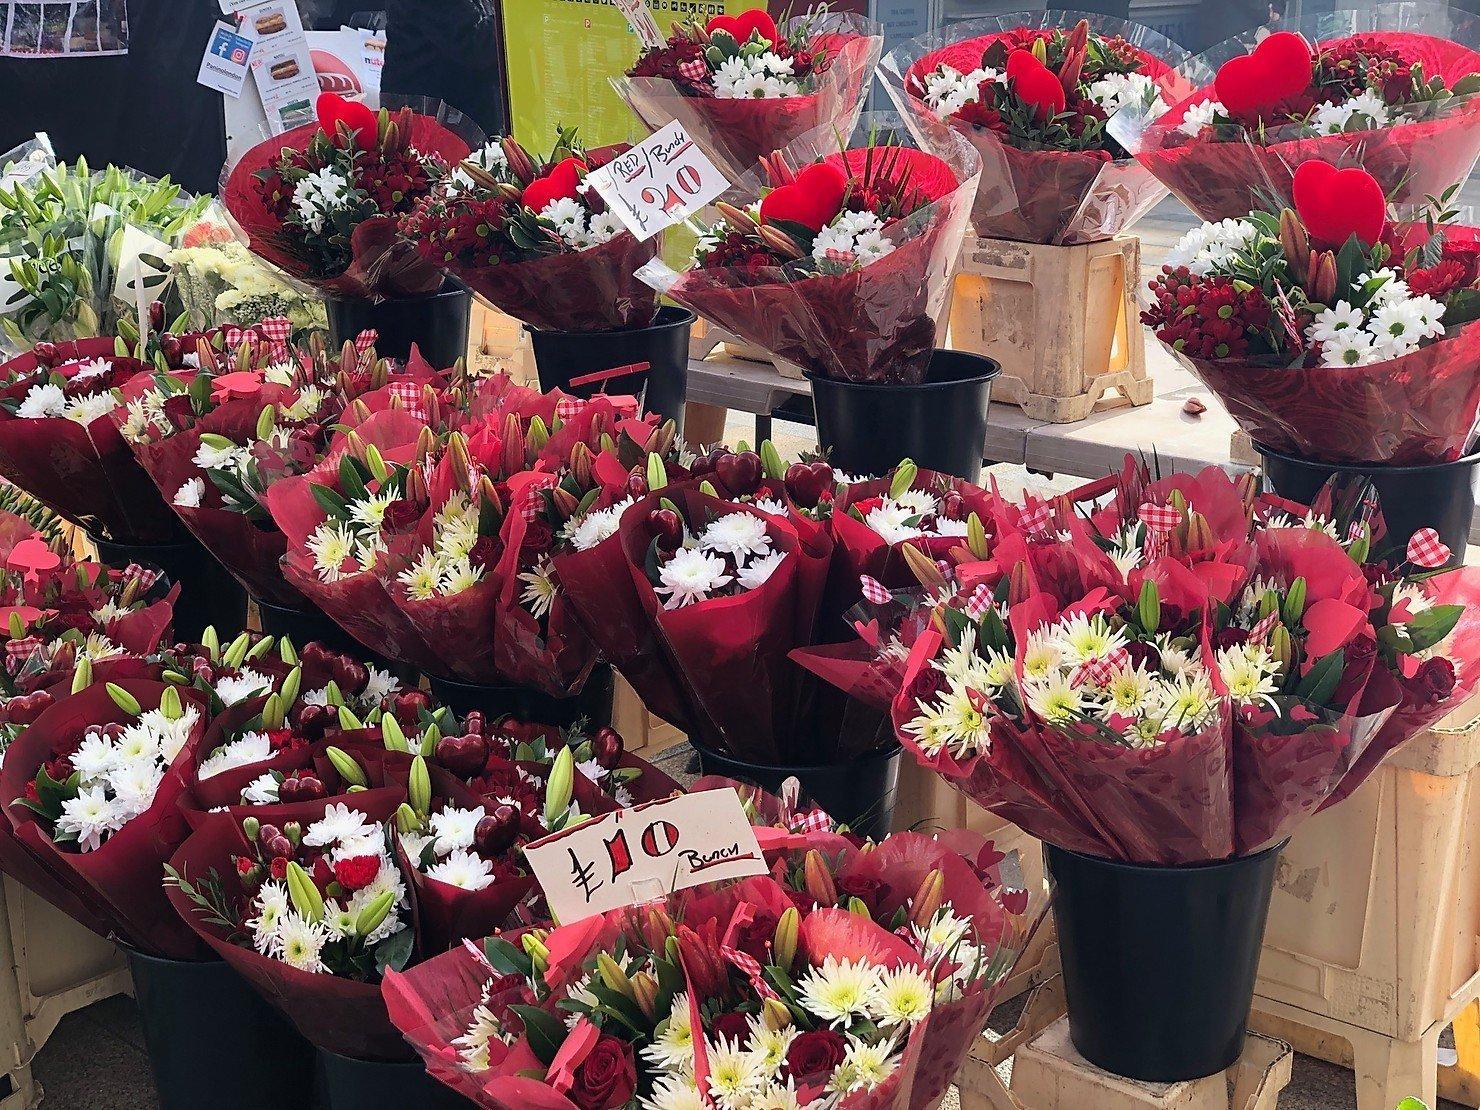 A visit to Bracknell Market